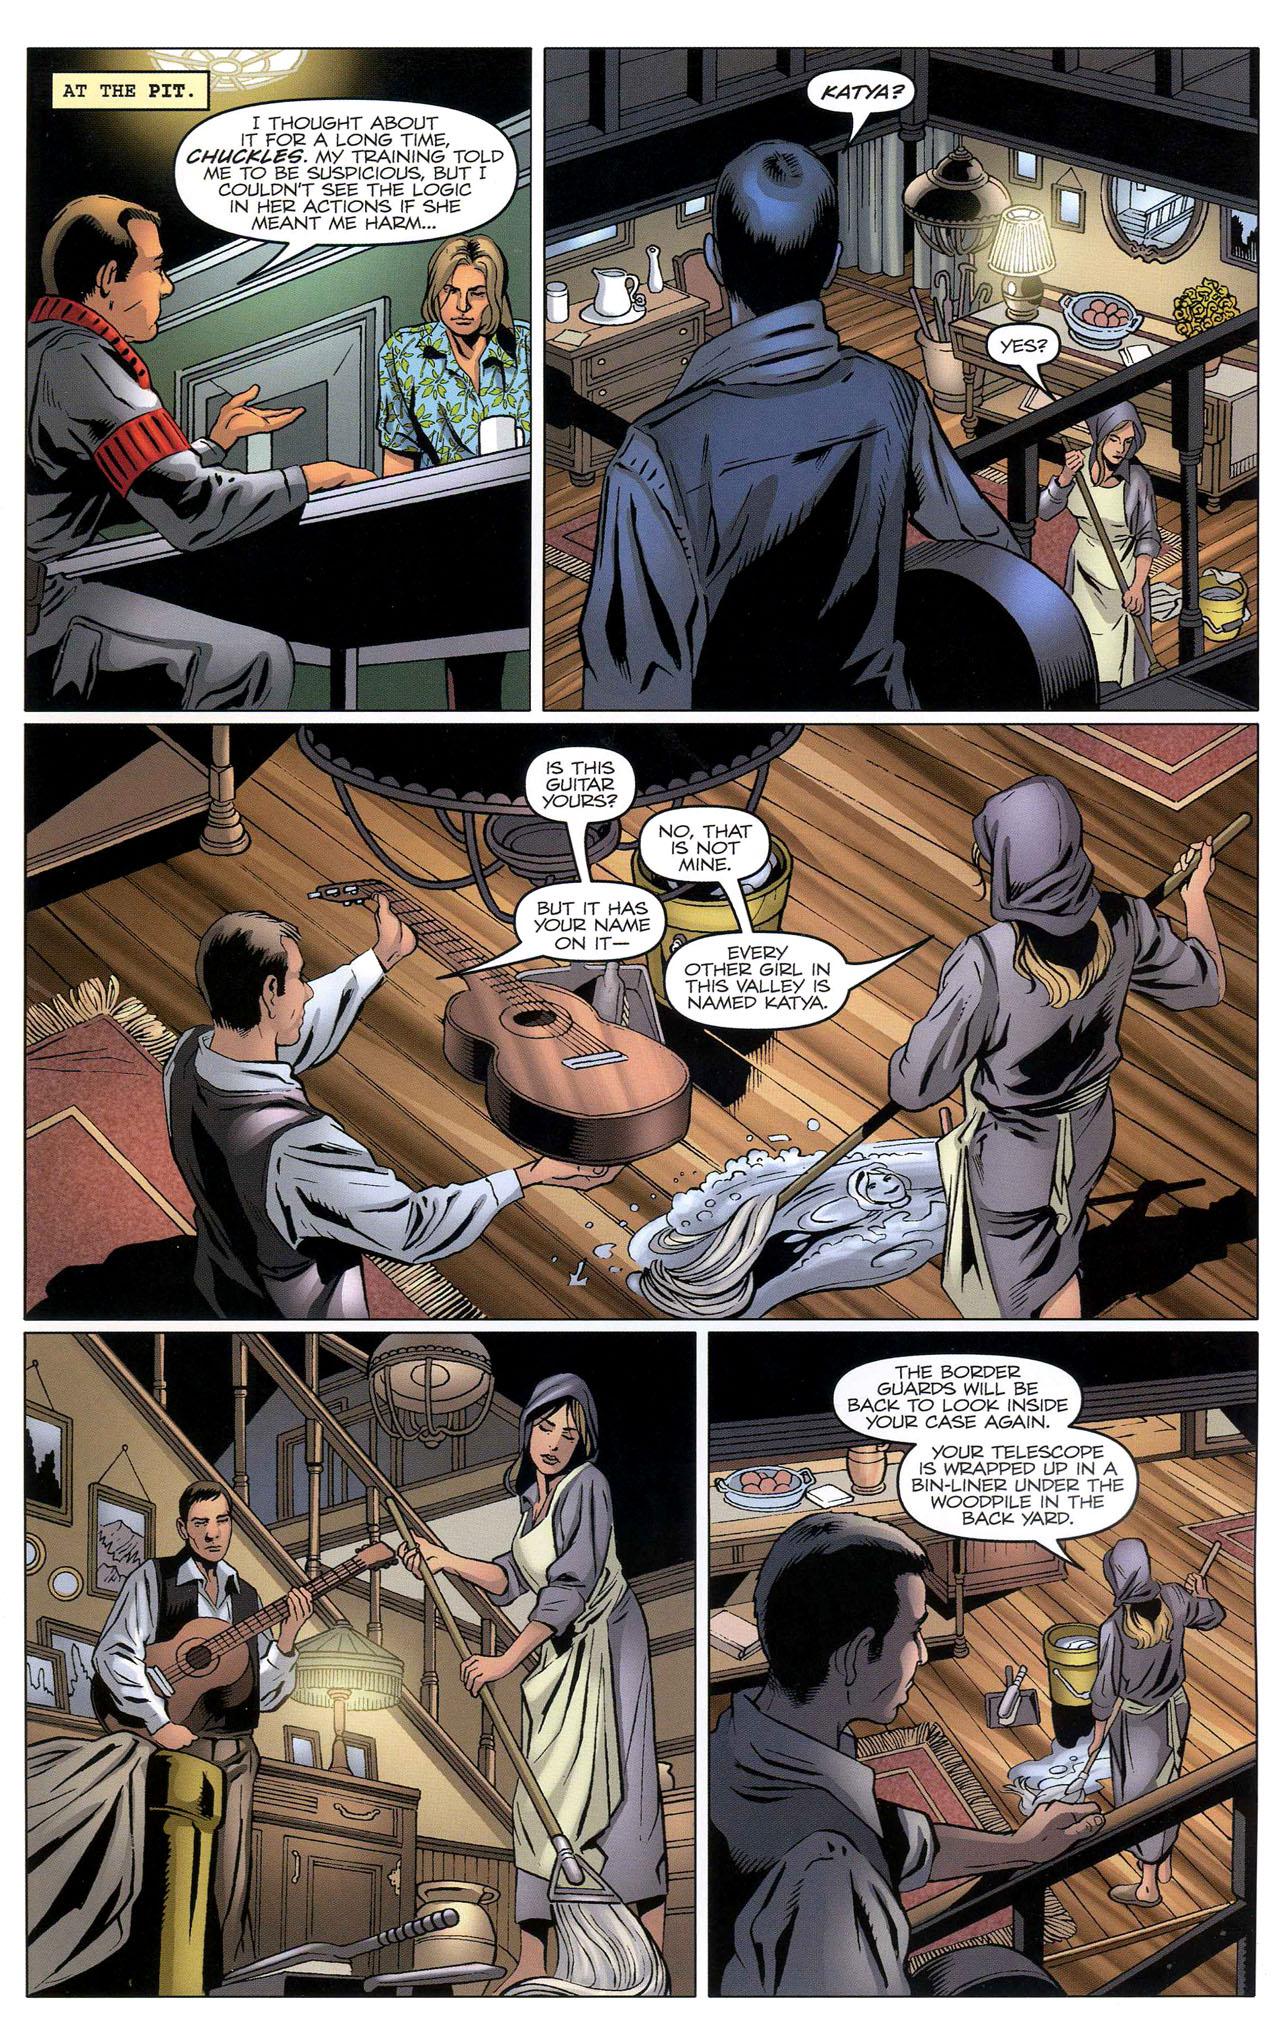 G.I. Joe: A Real American Hero 171 Page 4